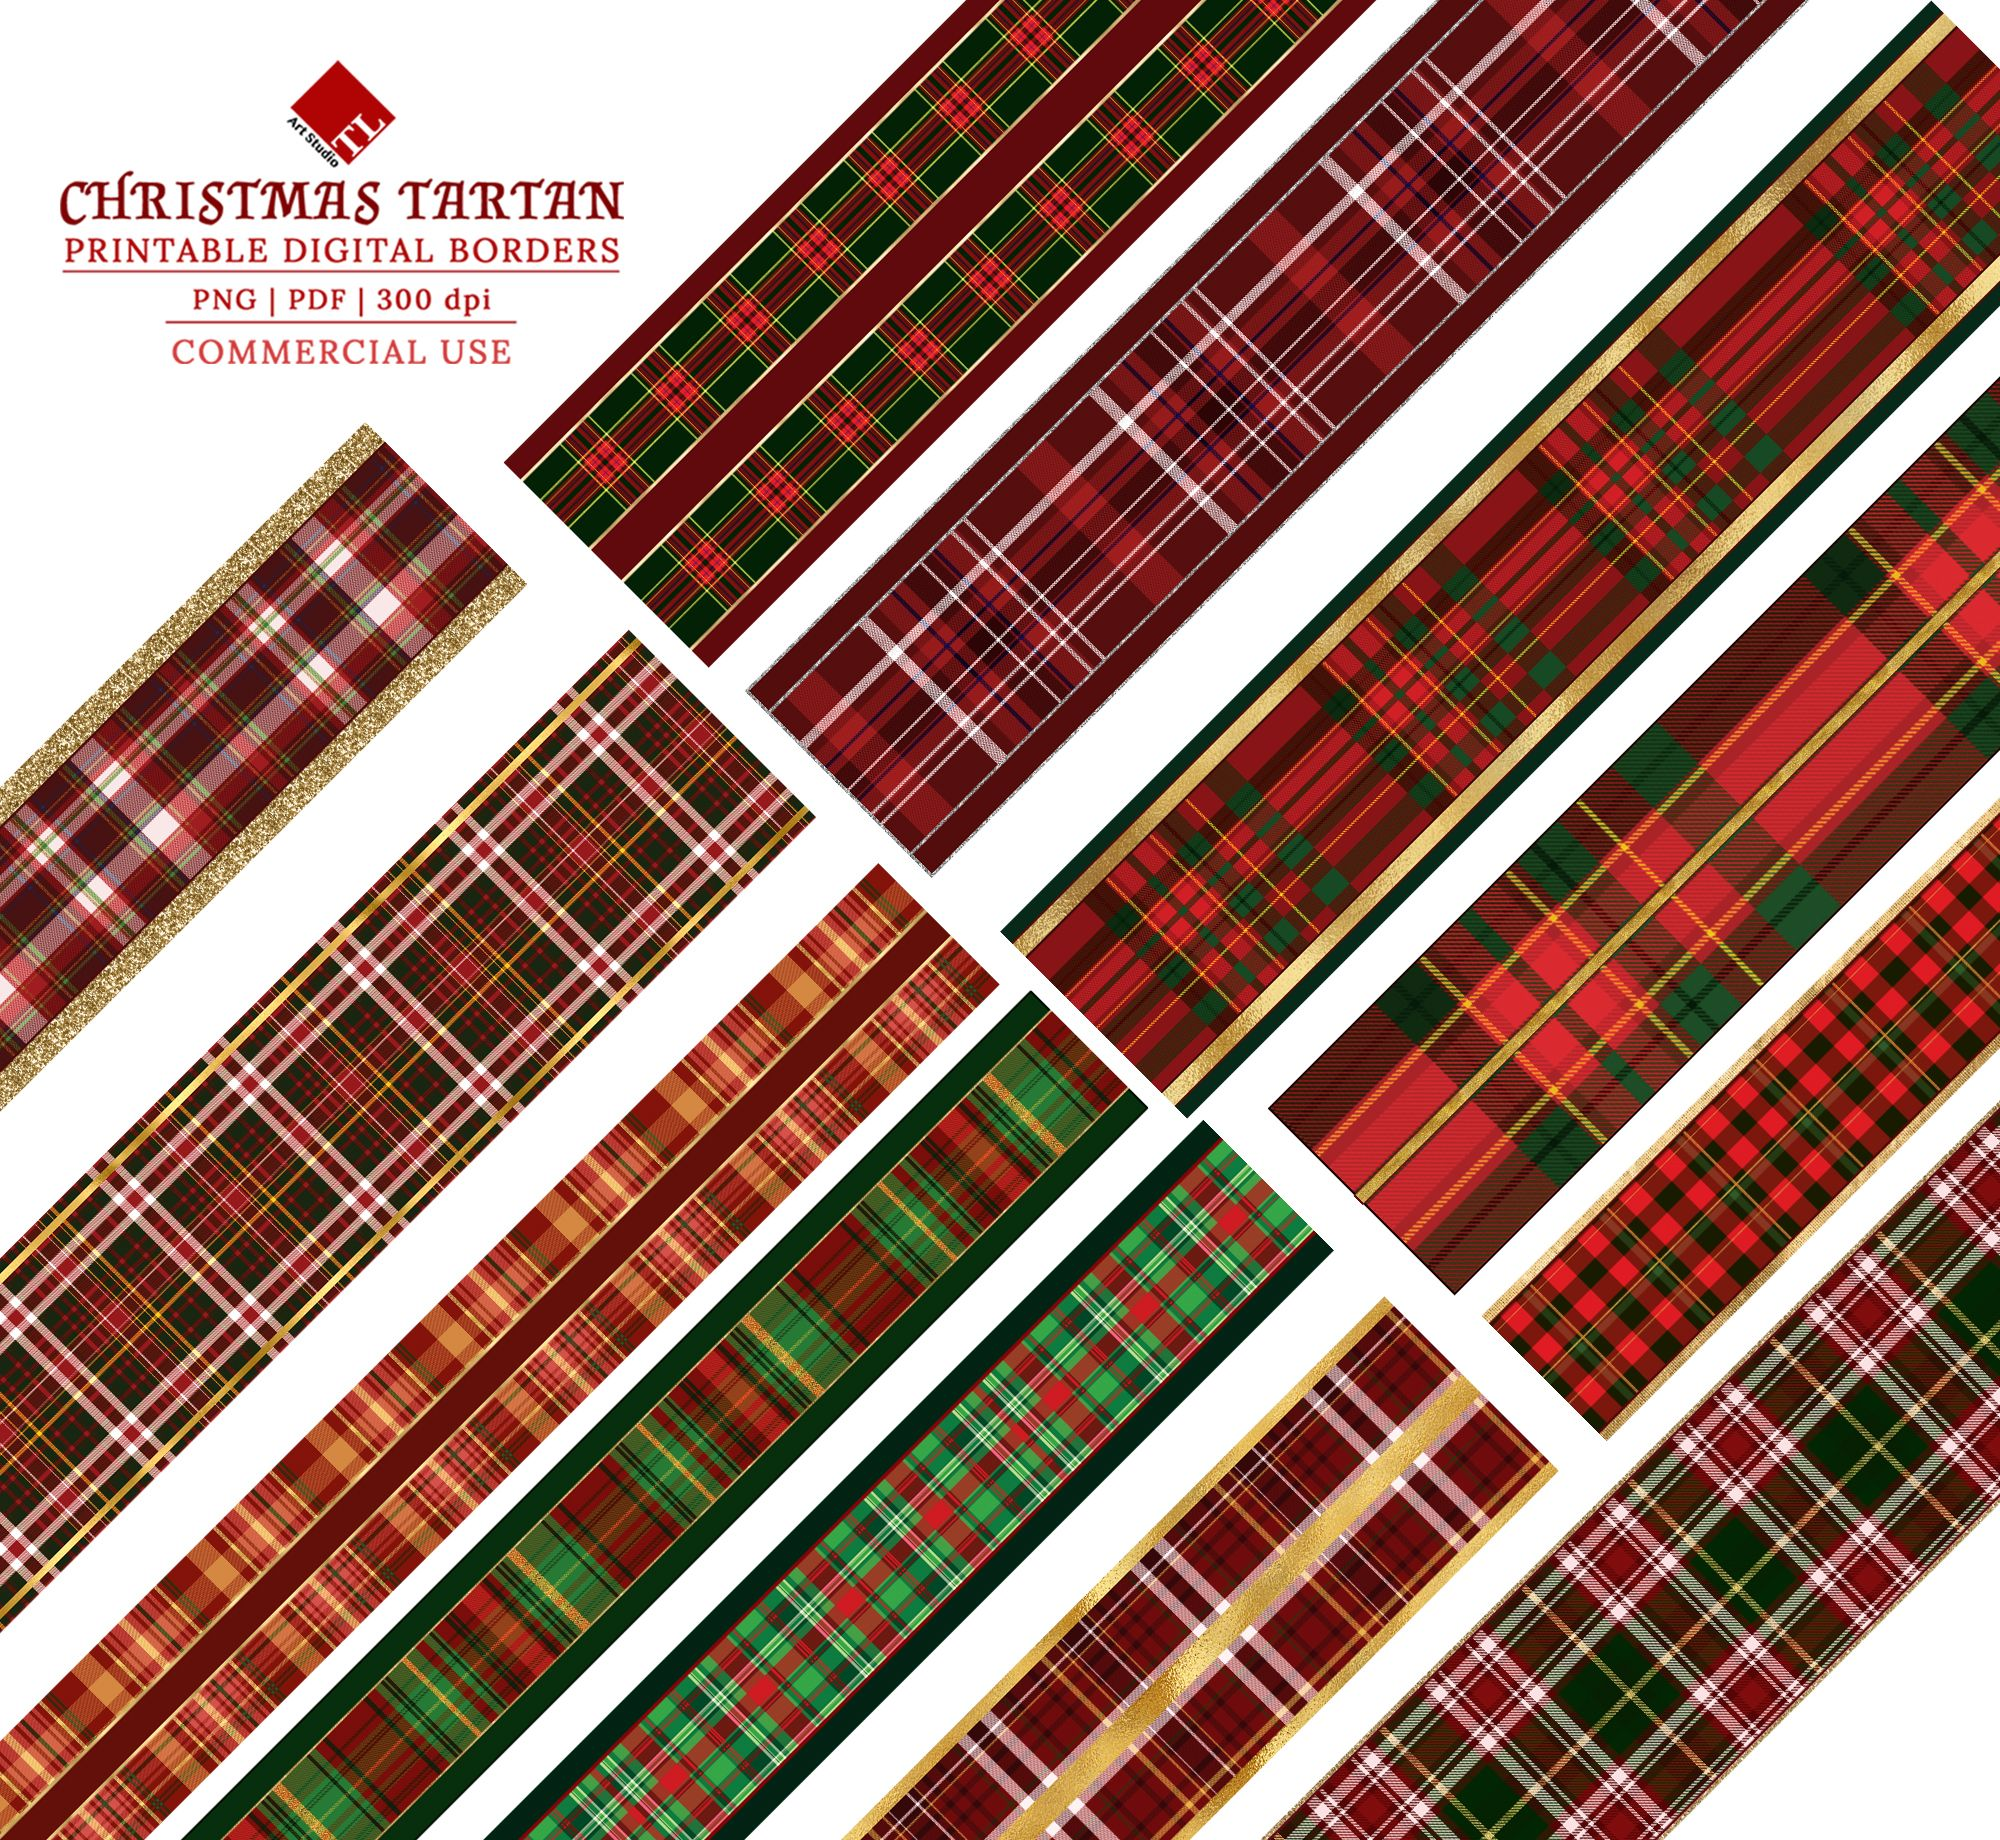 Digital Christmas Borders,Christmas Tartan Border Clipart.